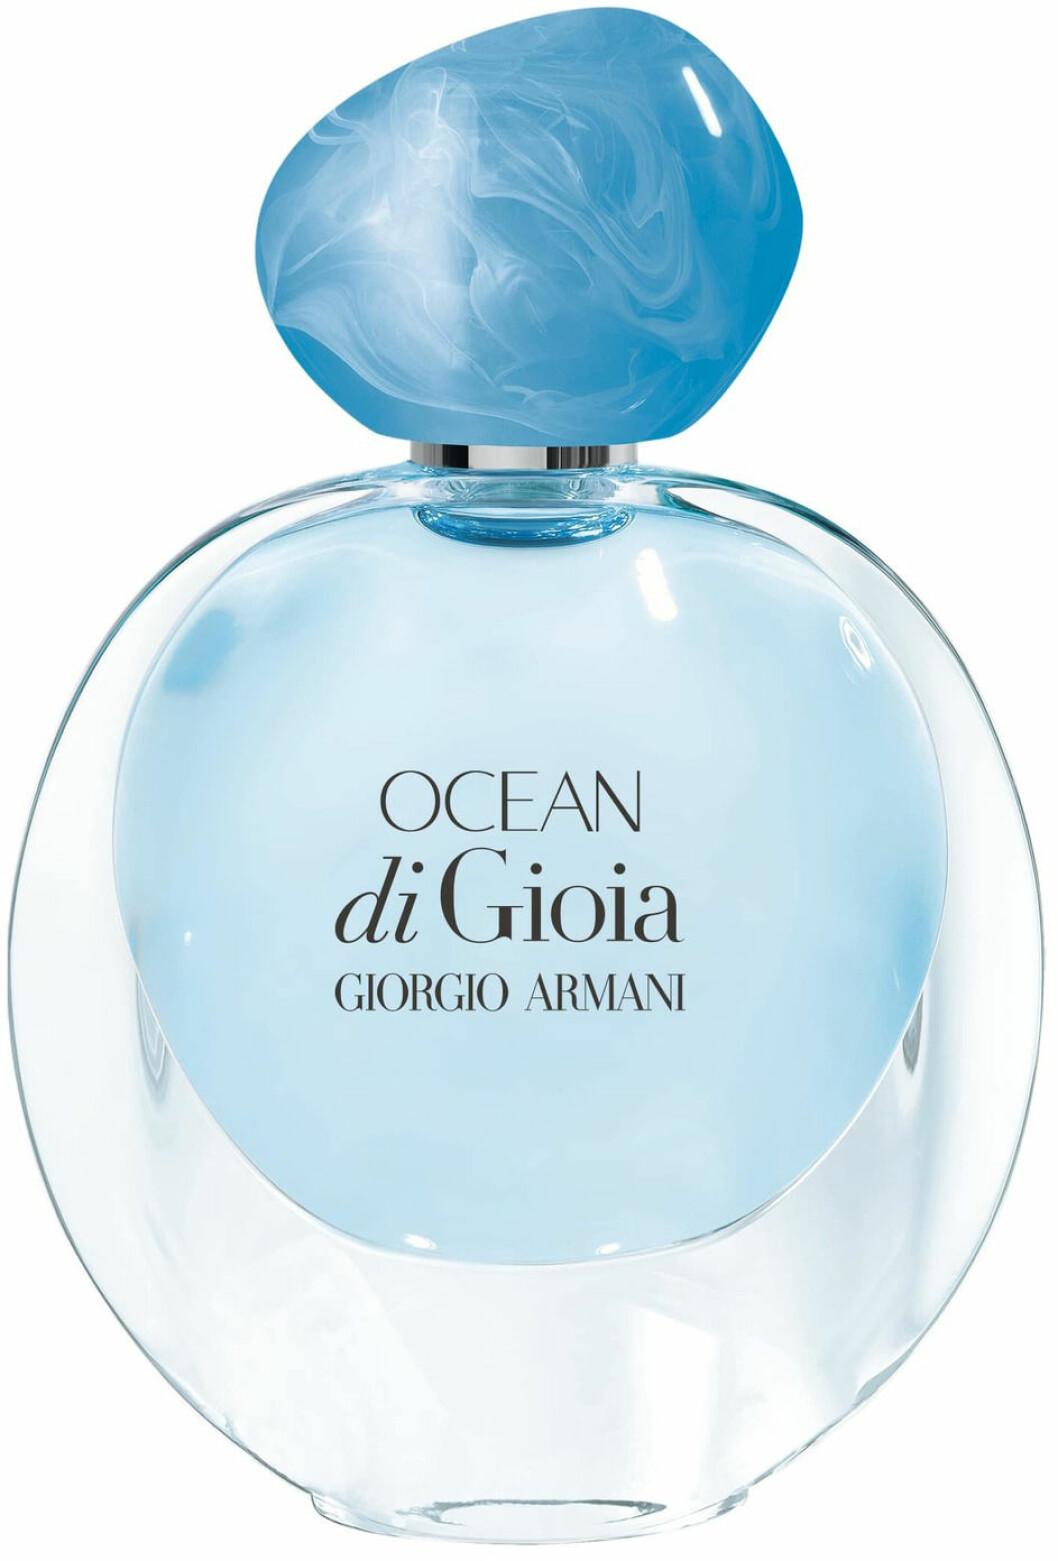 Ocean di Gioia från Armani